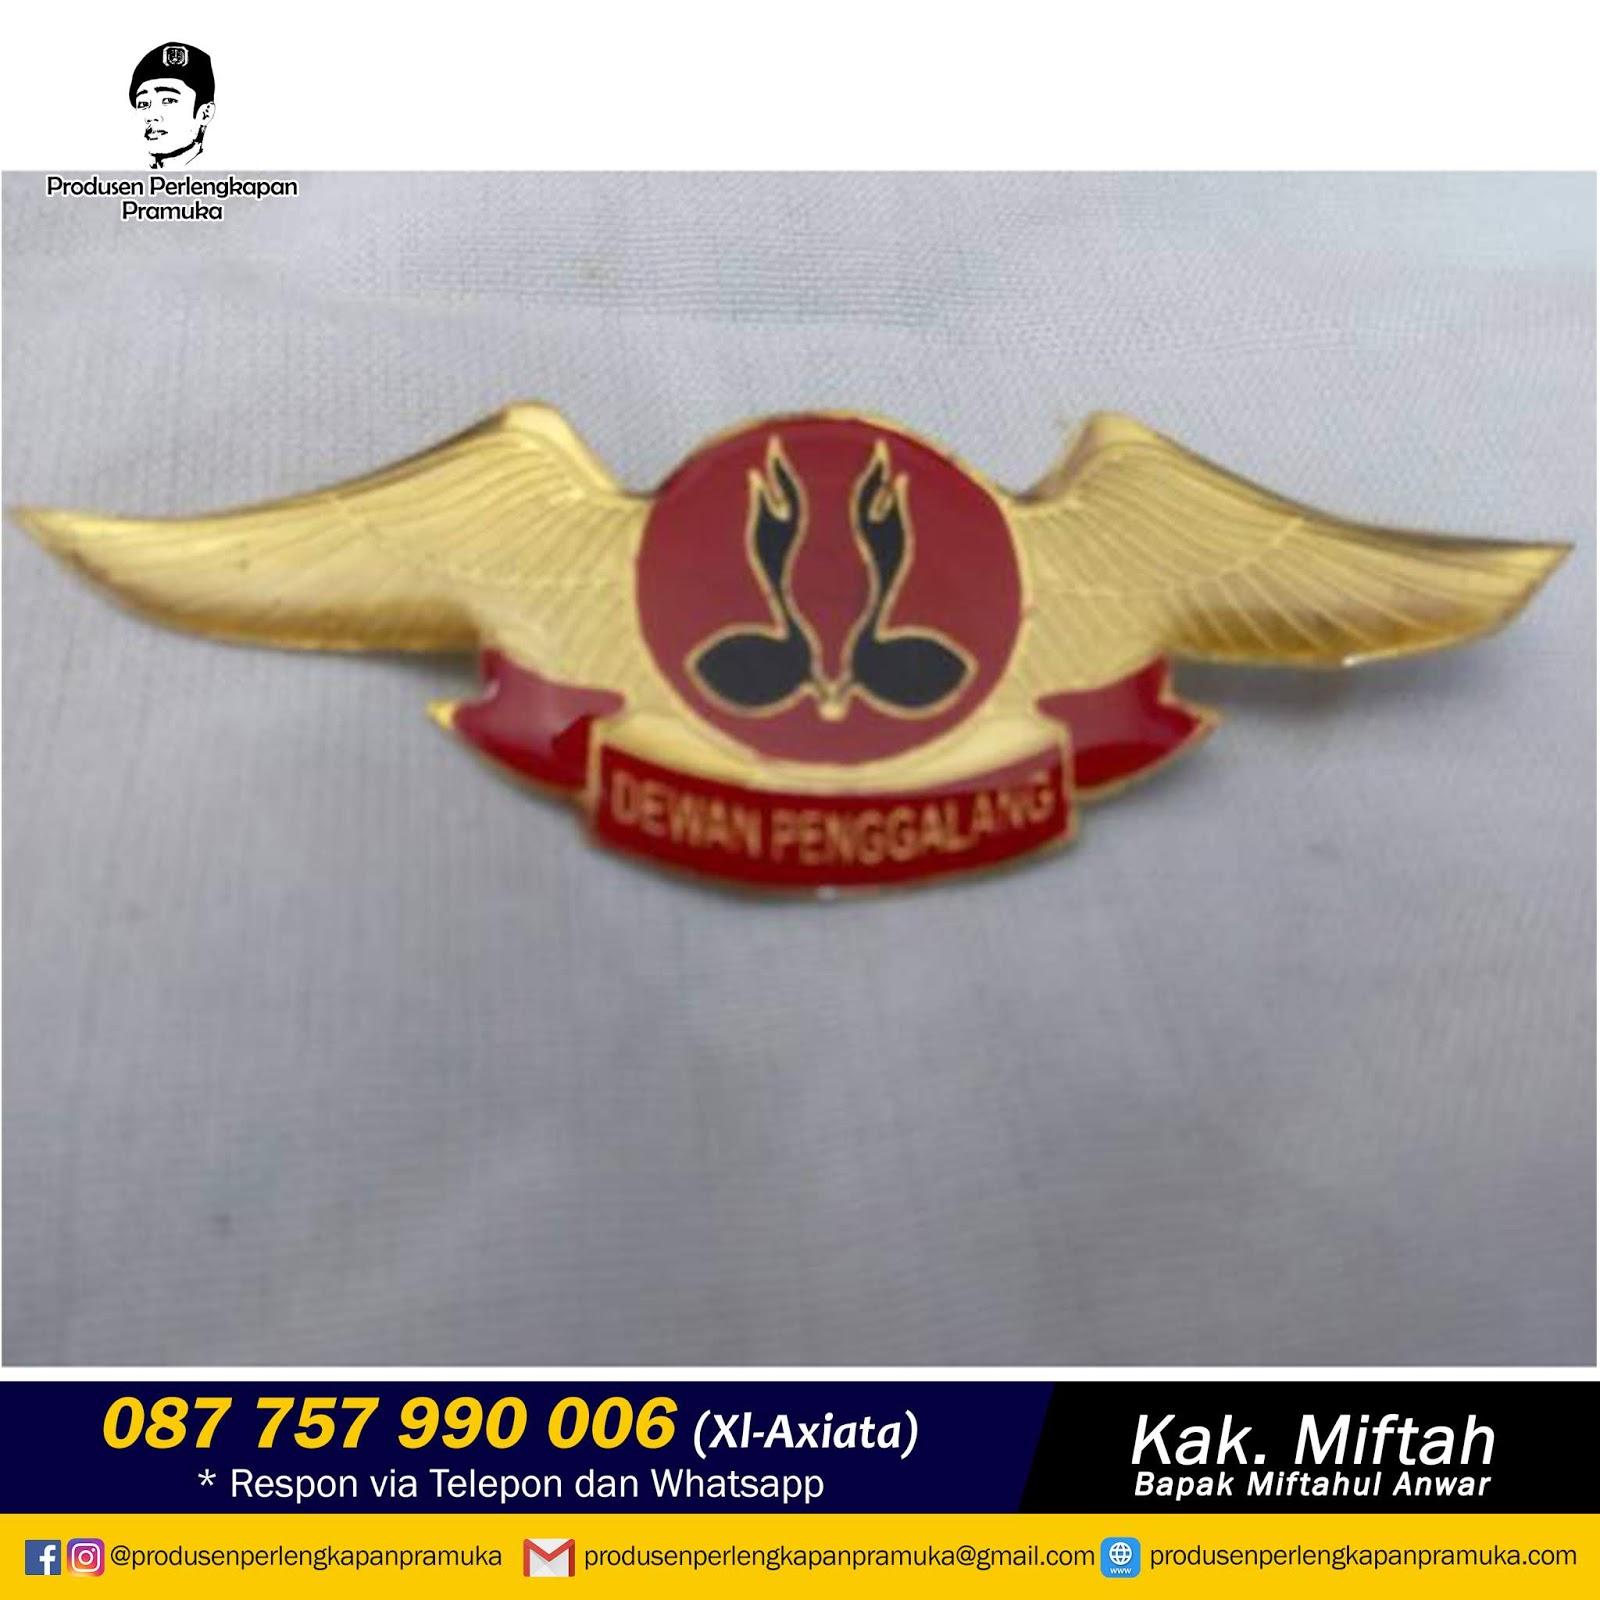 Jual Wing Pramuka Penggalang |  Grosir Wing Pramuka Penggalang | Produksi Wing Pramuka Penggalang